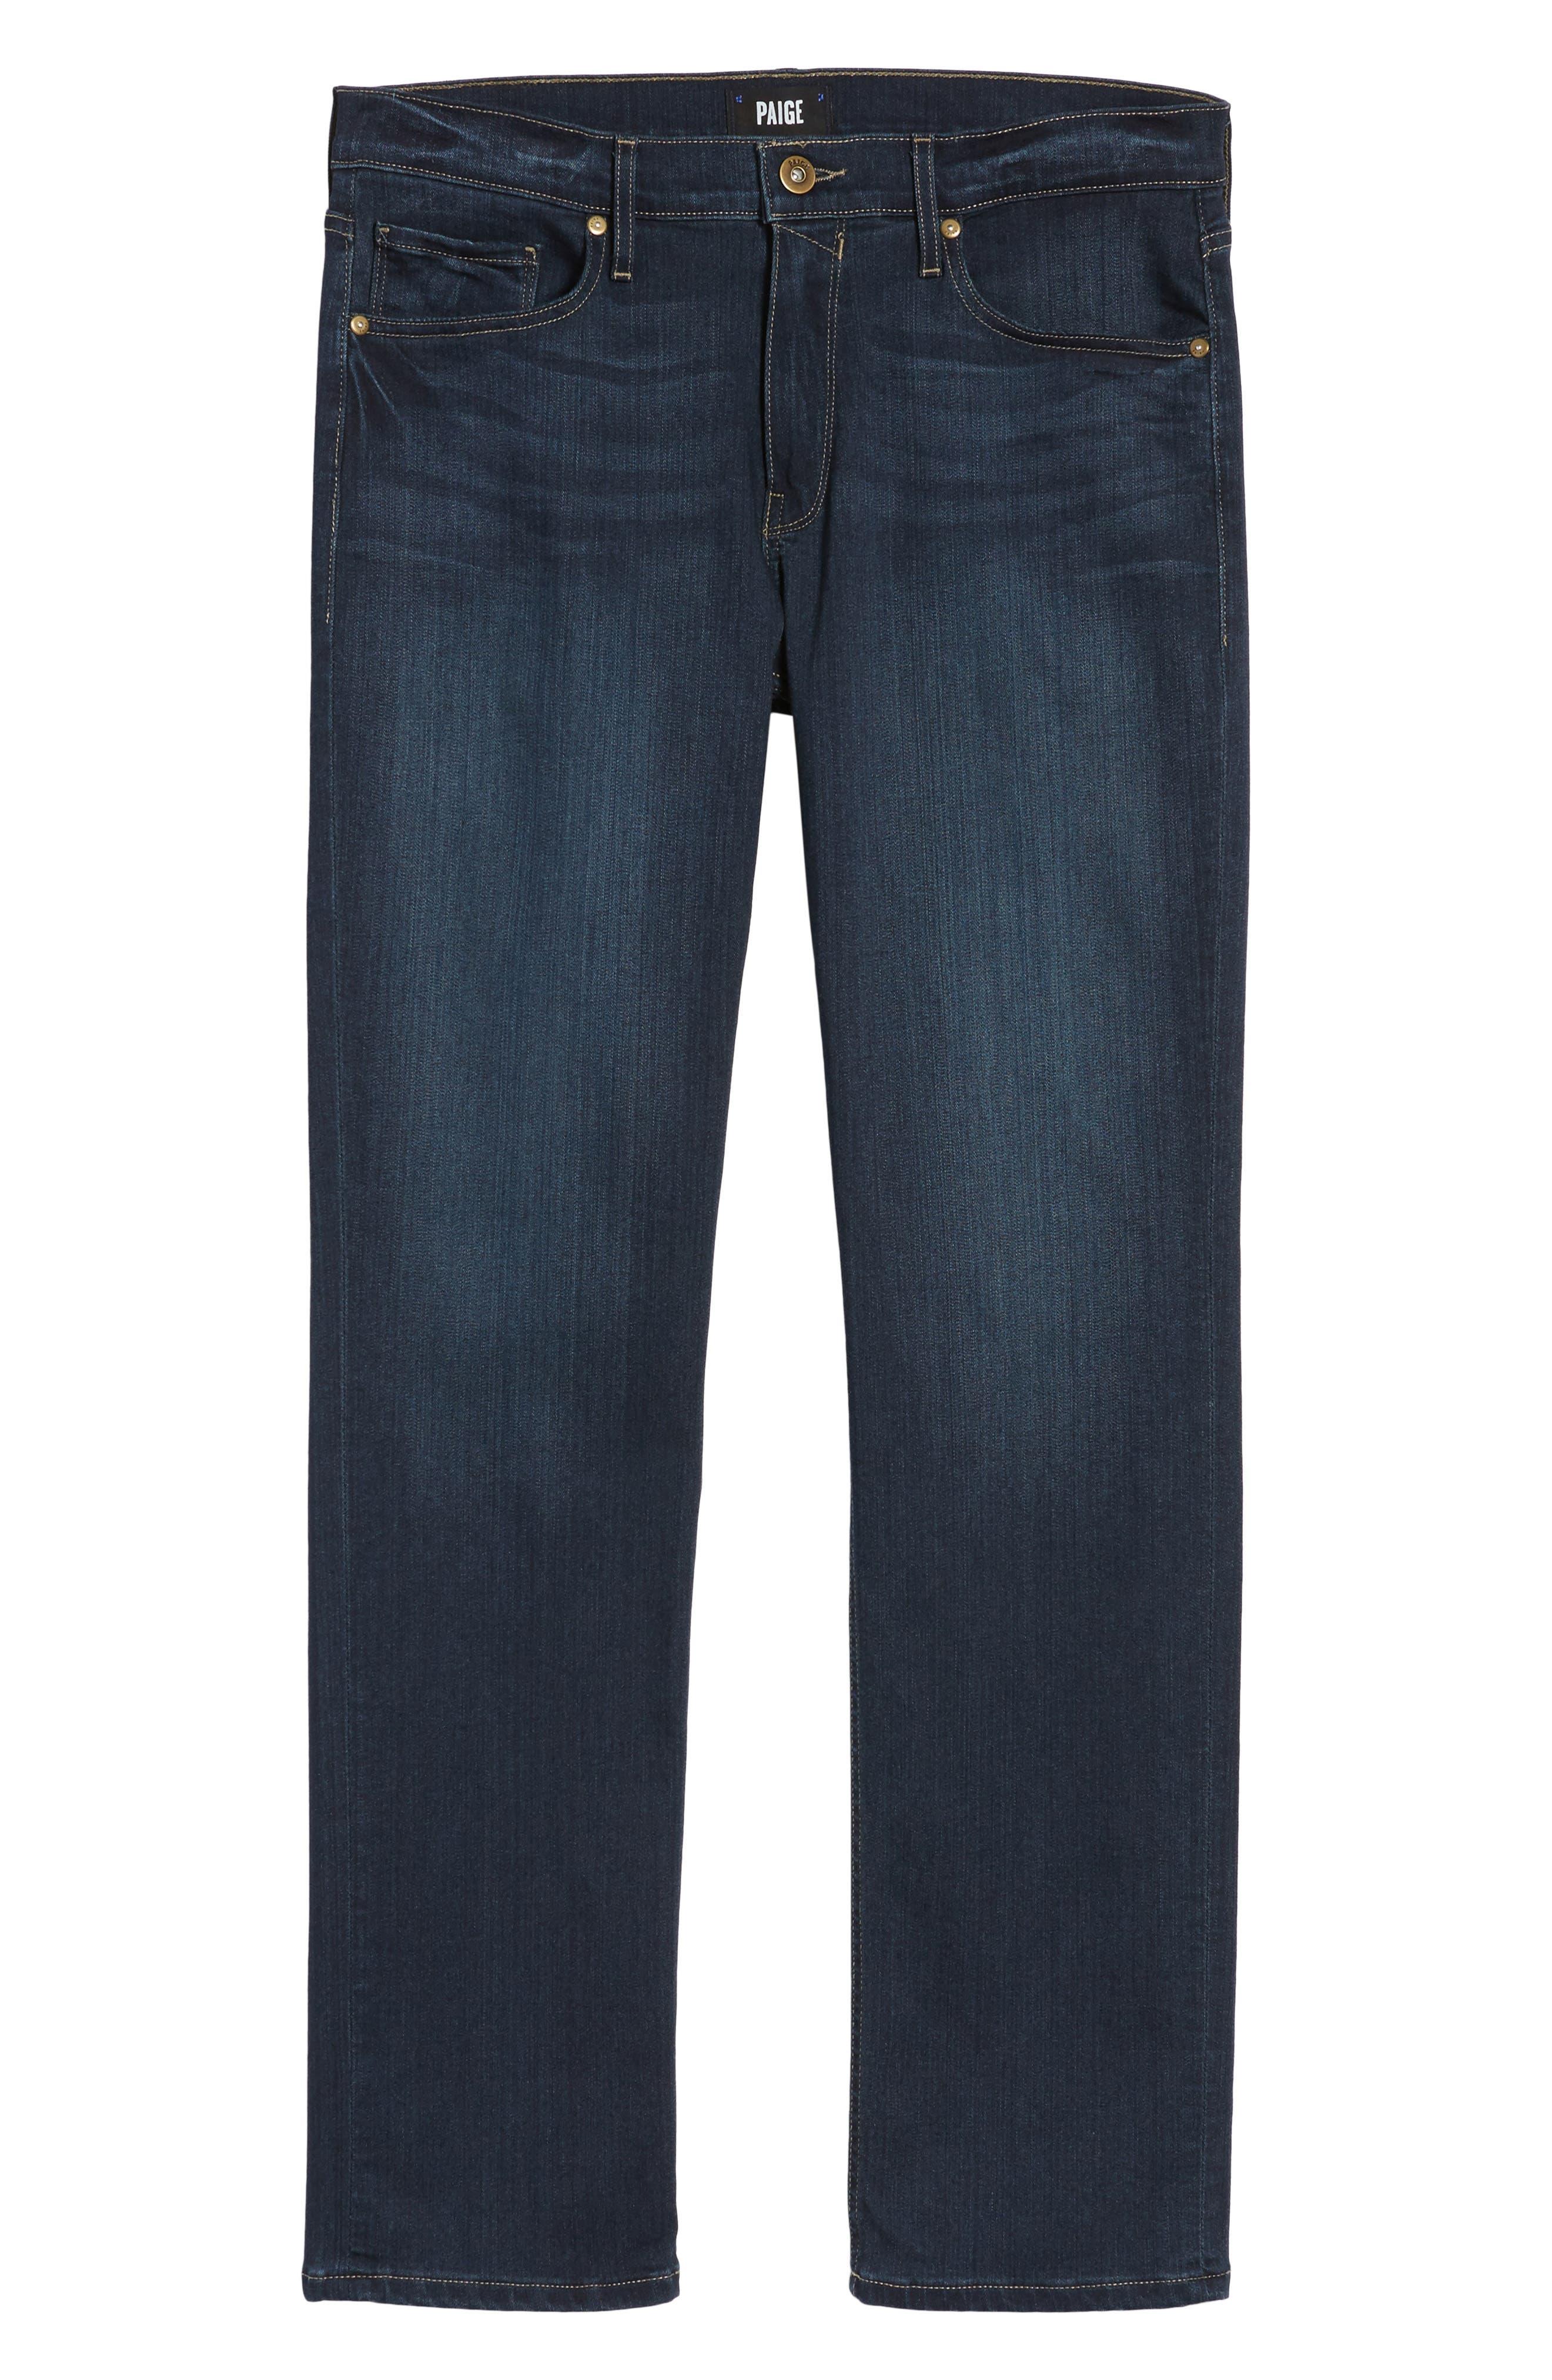 Transcend - Normandie Straight Fit Jeans,                             Alternate thumbnail 6, color,